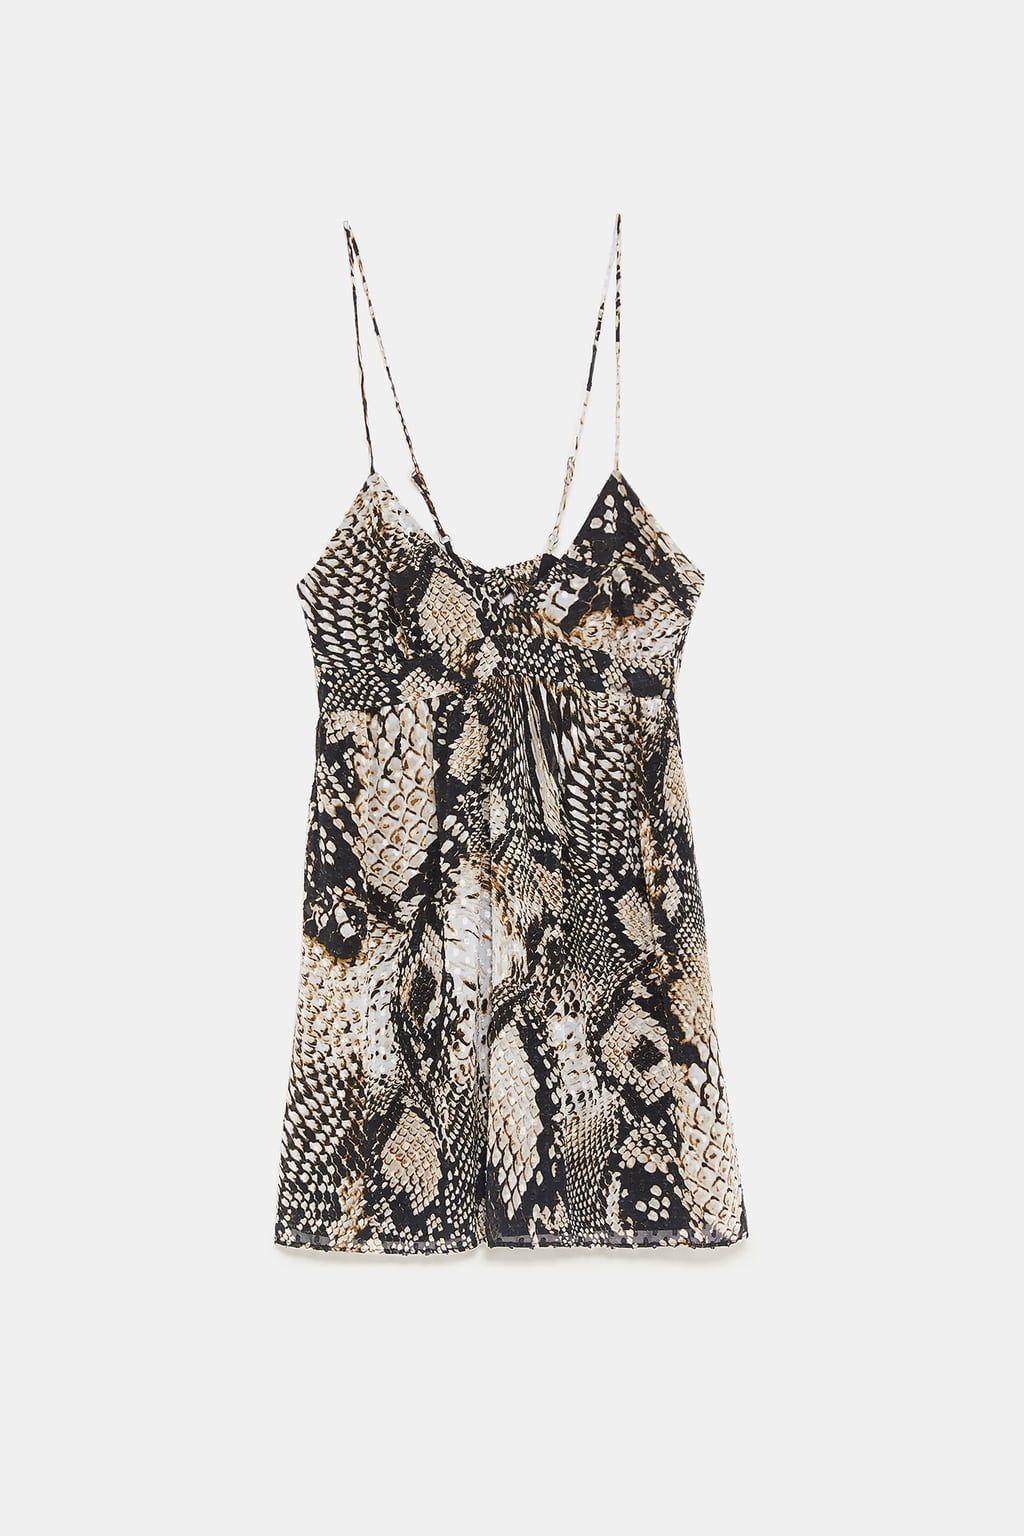 d874237889 Image 8 of SNAKESKIN PRINT DOTTED MESH DRESS from Zara